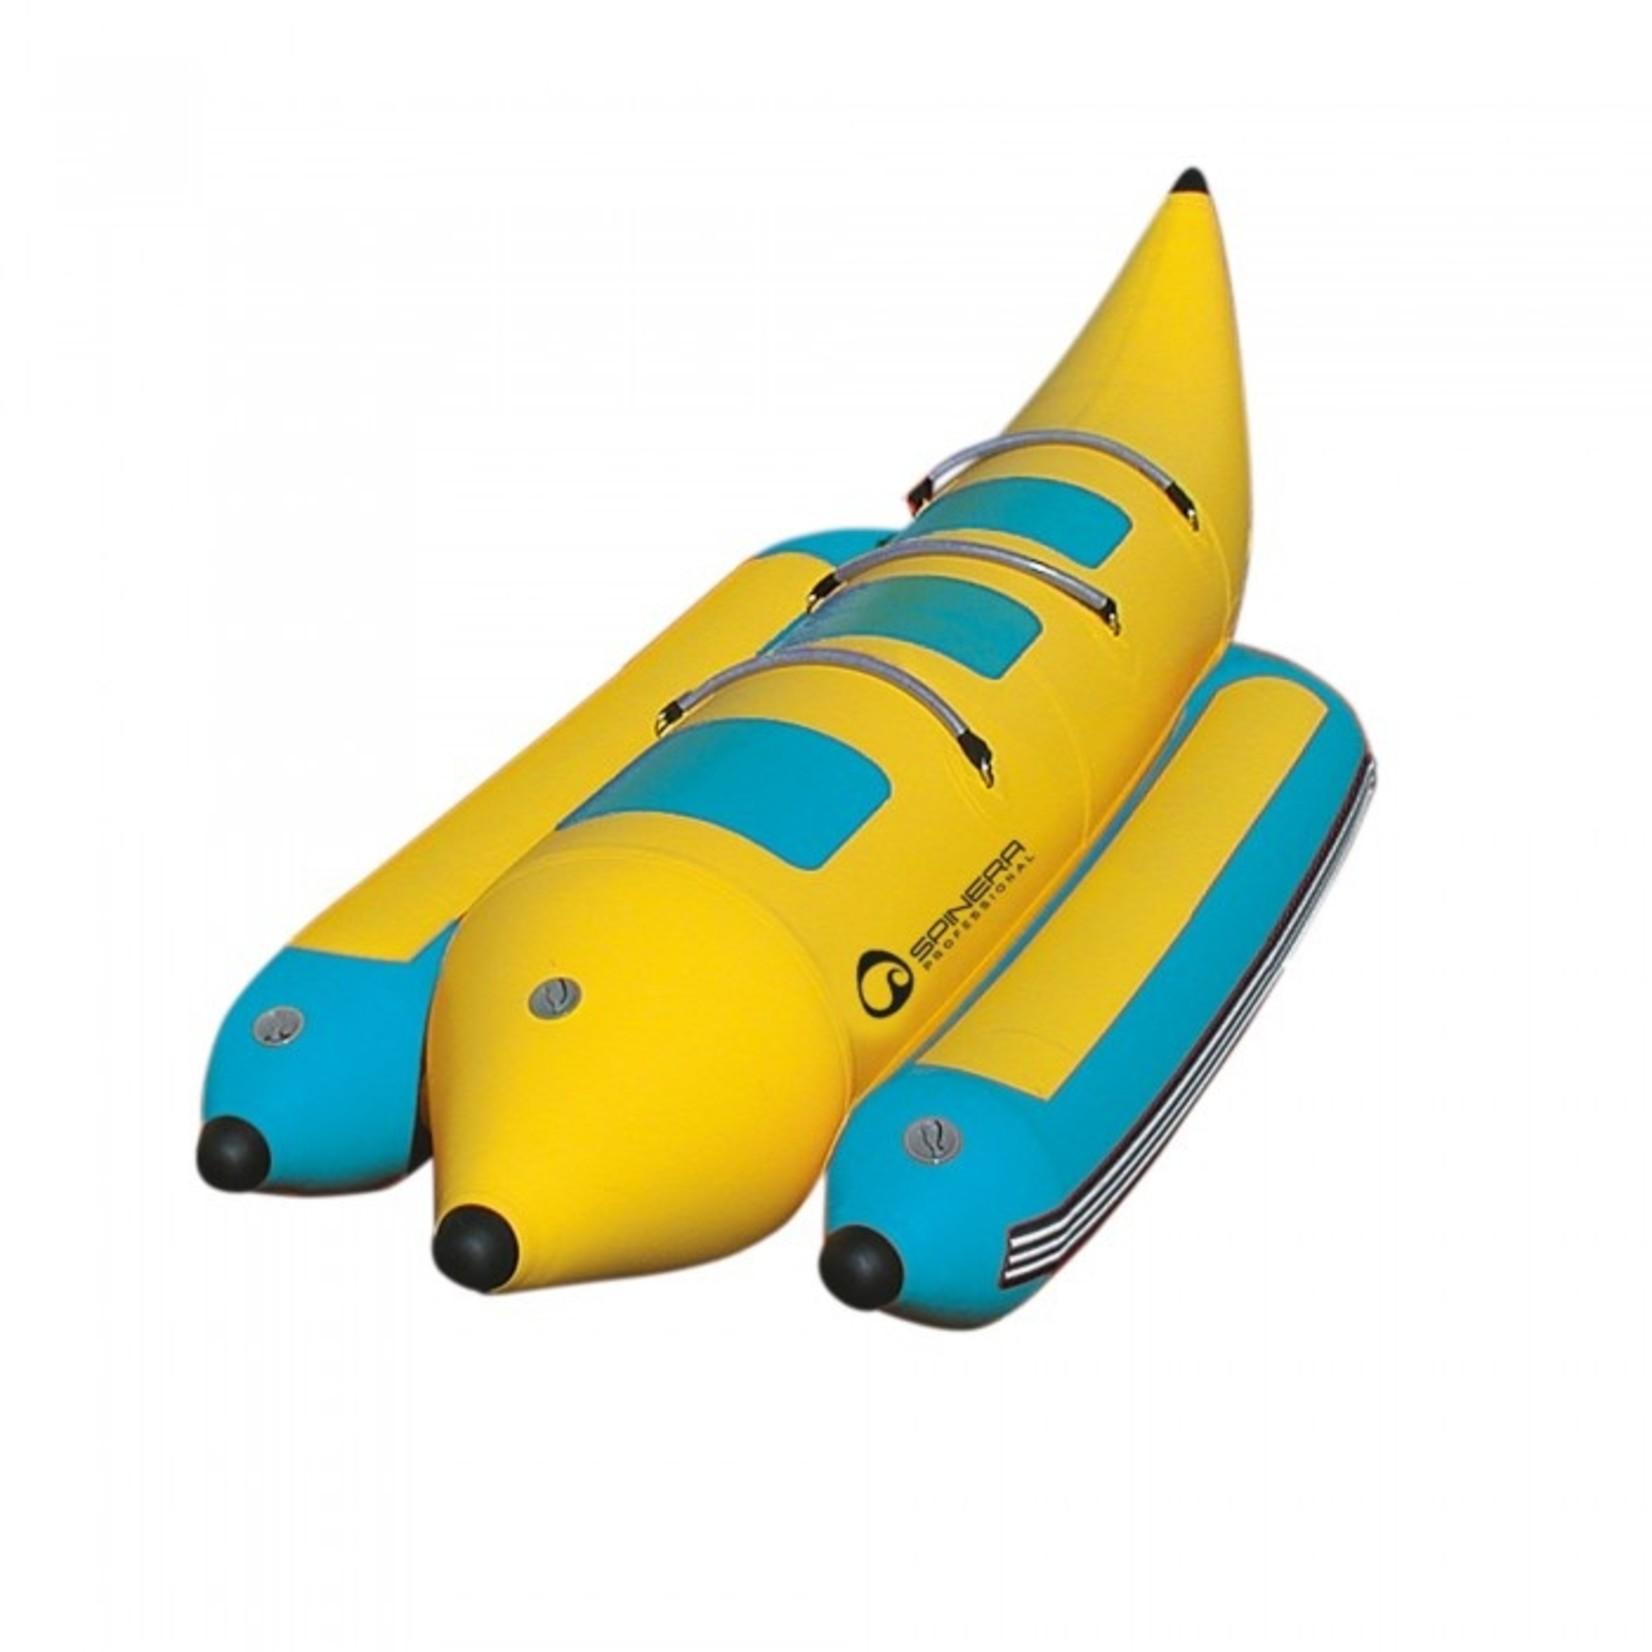 Spinera Professional Multi-Rider 3 - Triple Banana